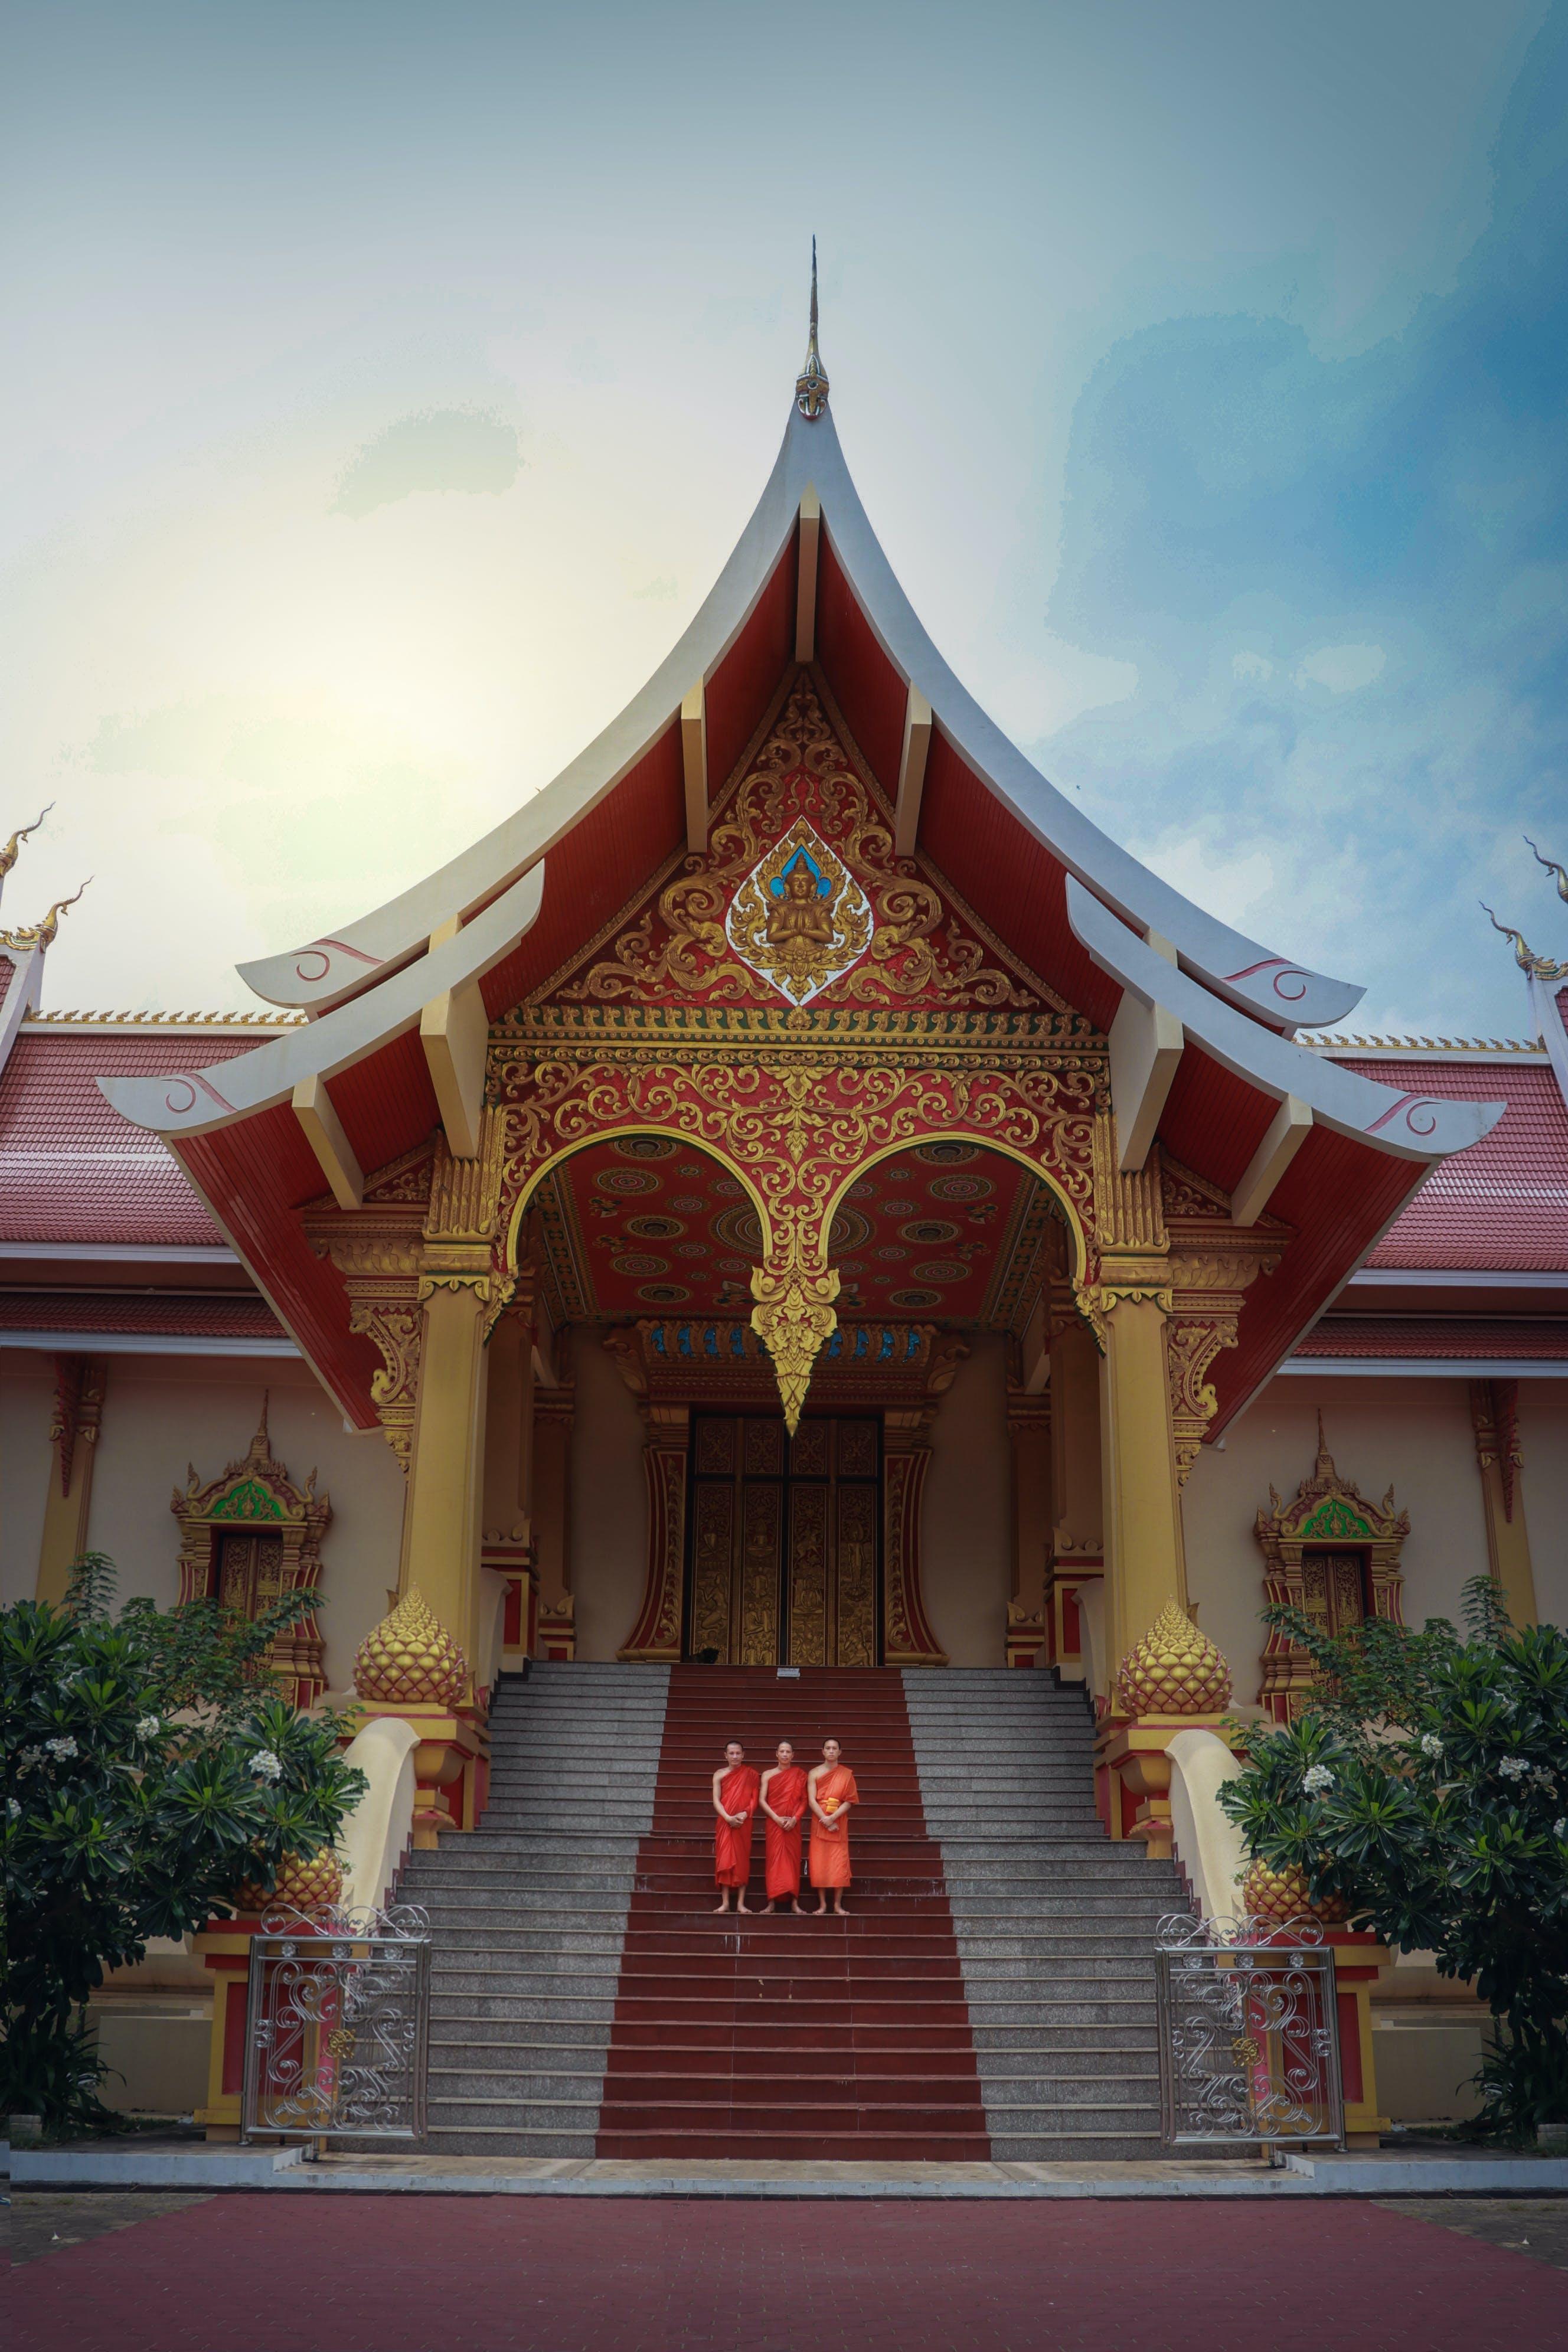 Free stock photo of Laos Dramma Hall